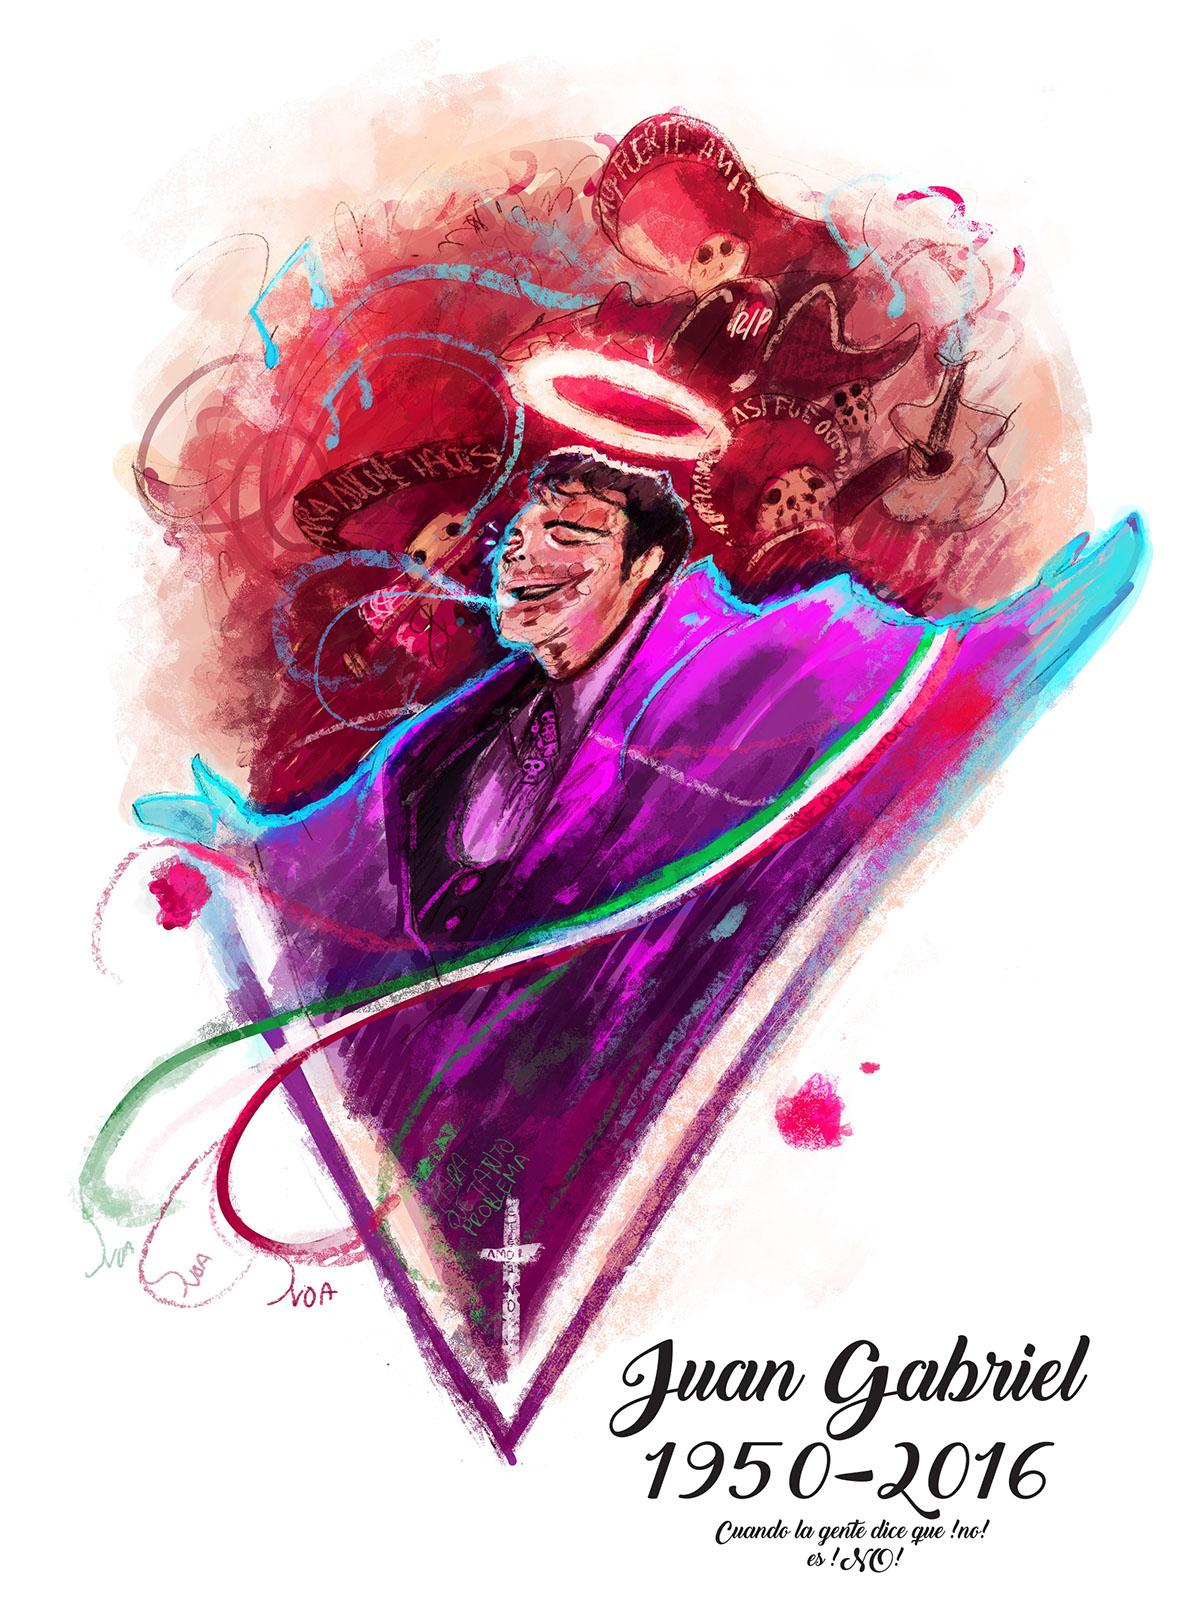 JUAN GABRIEL 01